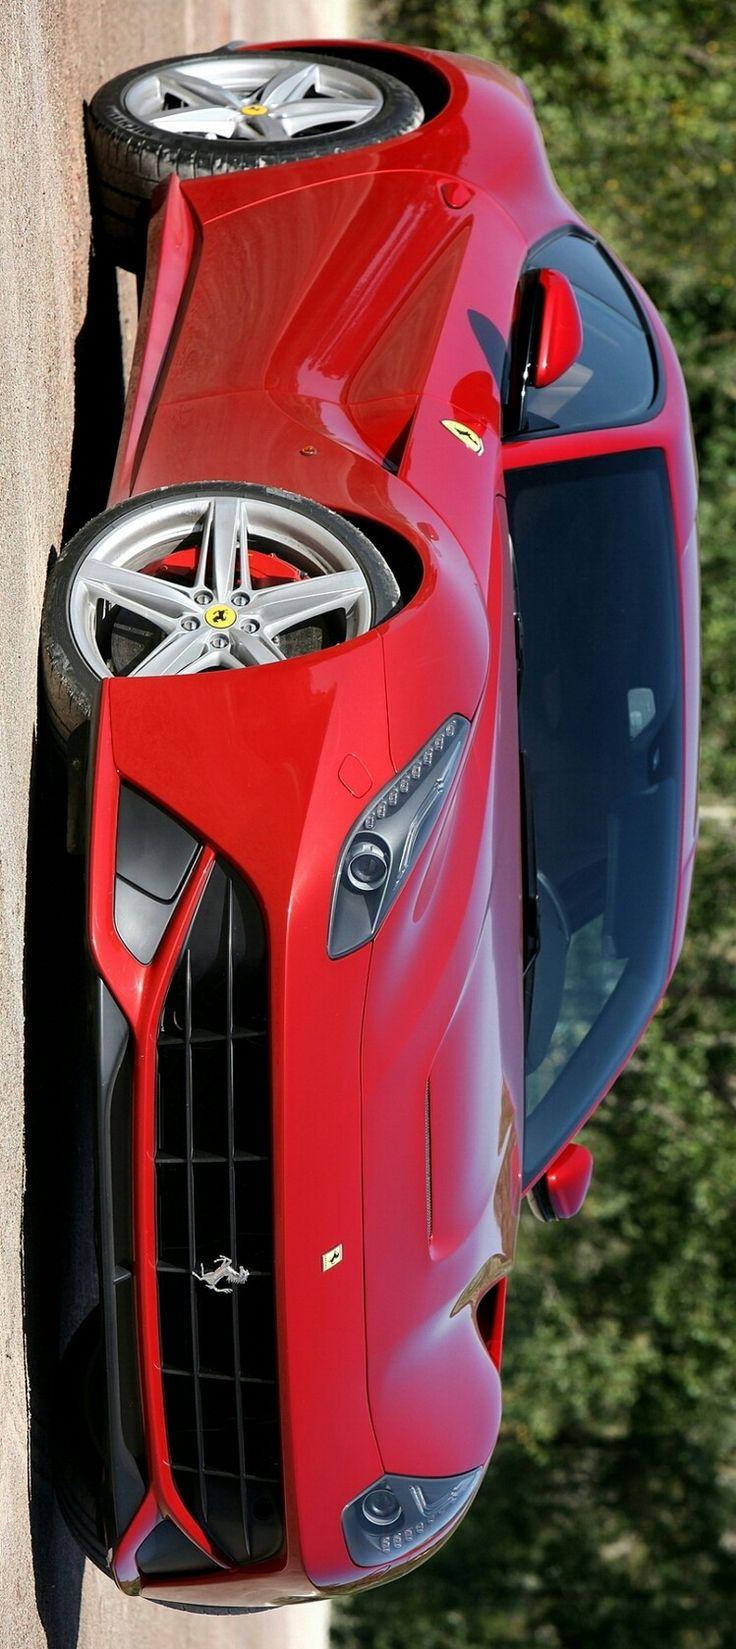 Ferrari Berlinetta by Levon